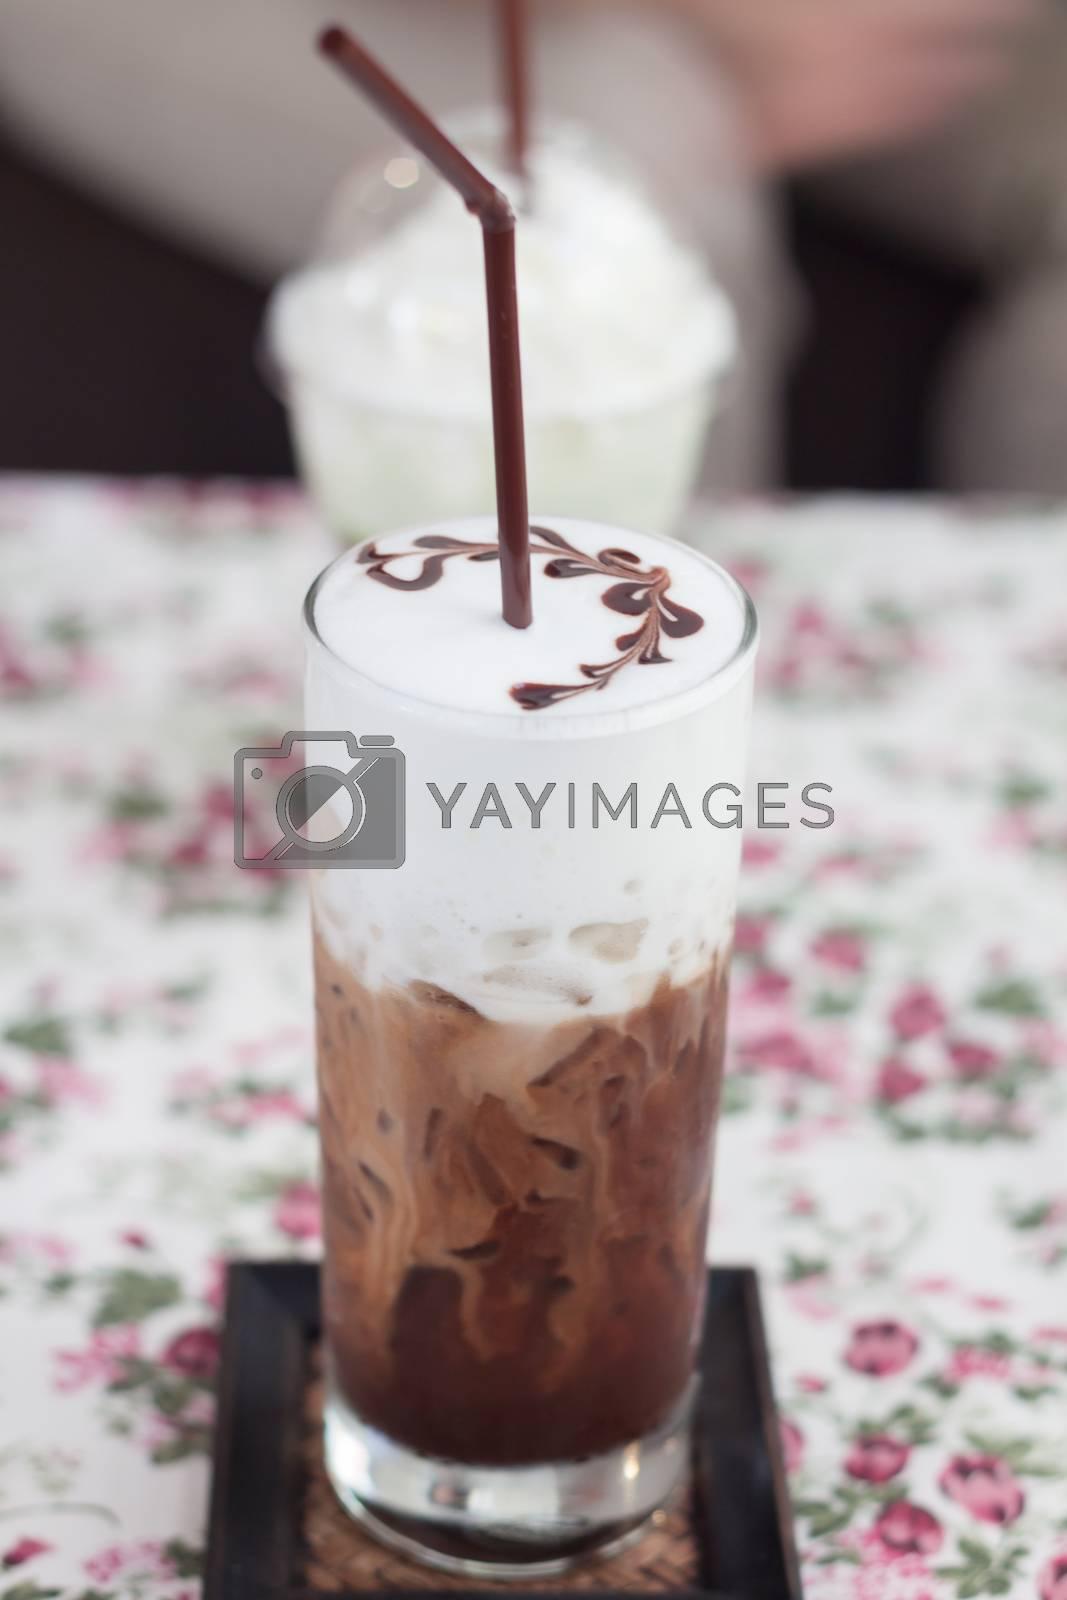 Iced mocha with milk micro foam, stock photo